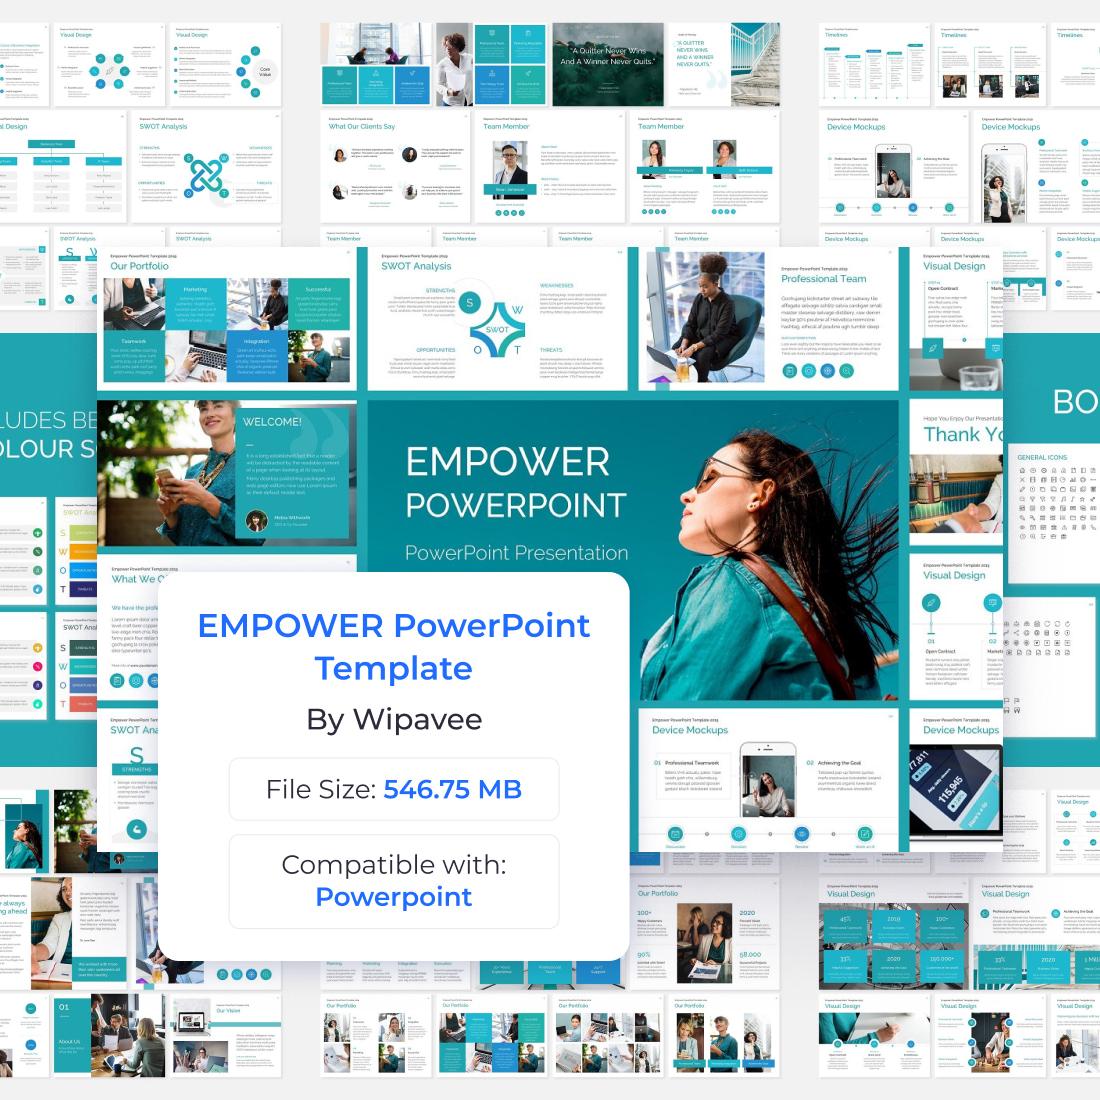 EMPOWER PowerPoint Template by MasterBundles.